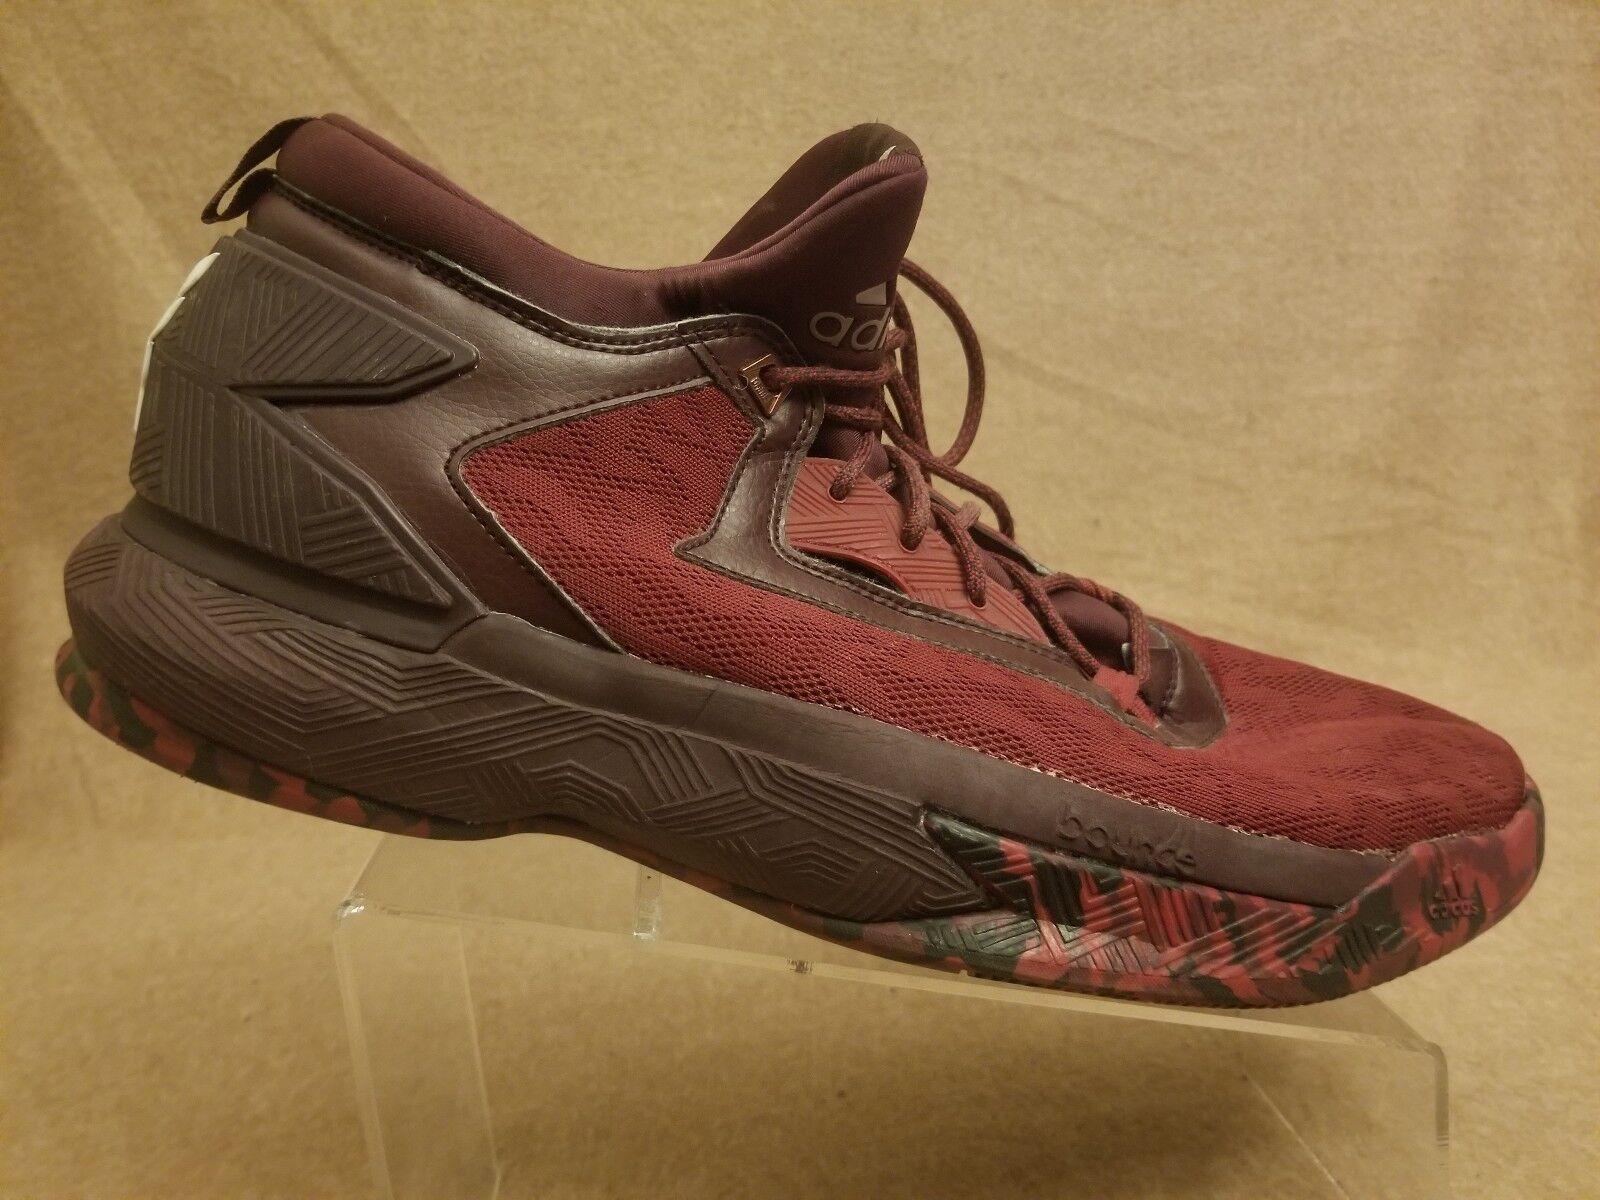 Adidas D Lillard 2 B42382 Damian Burgundy Maroon Basketball Sneaker Men Size 15